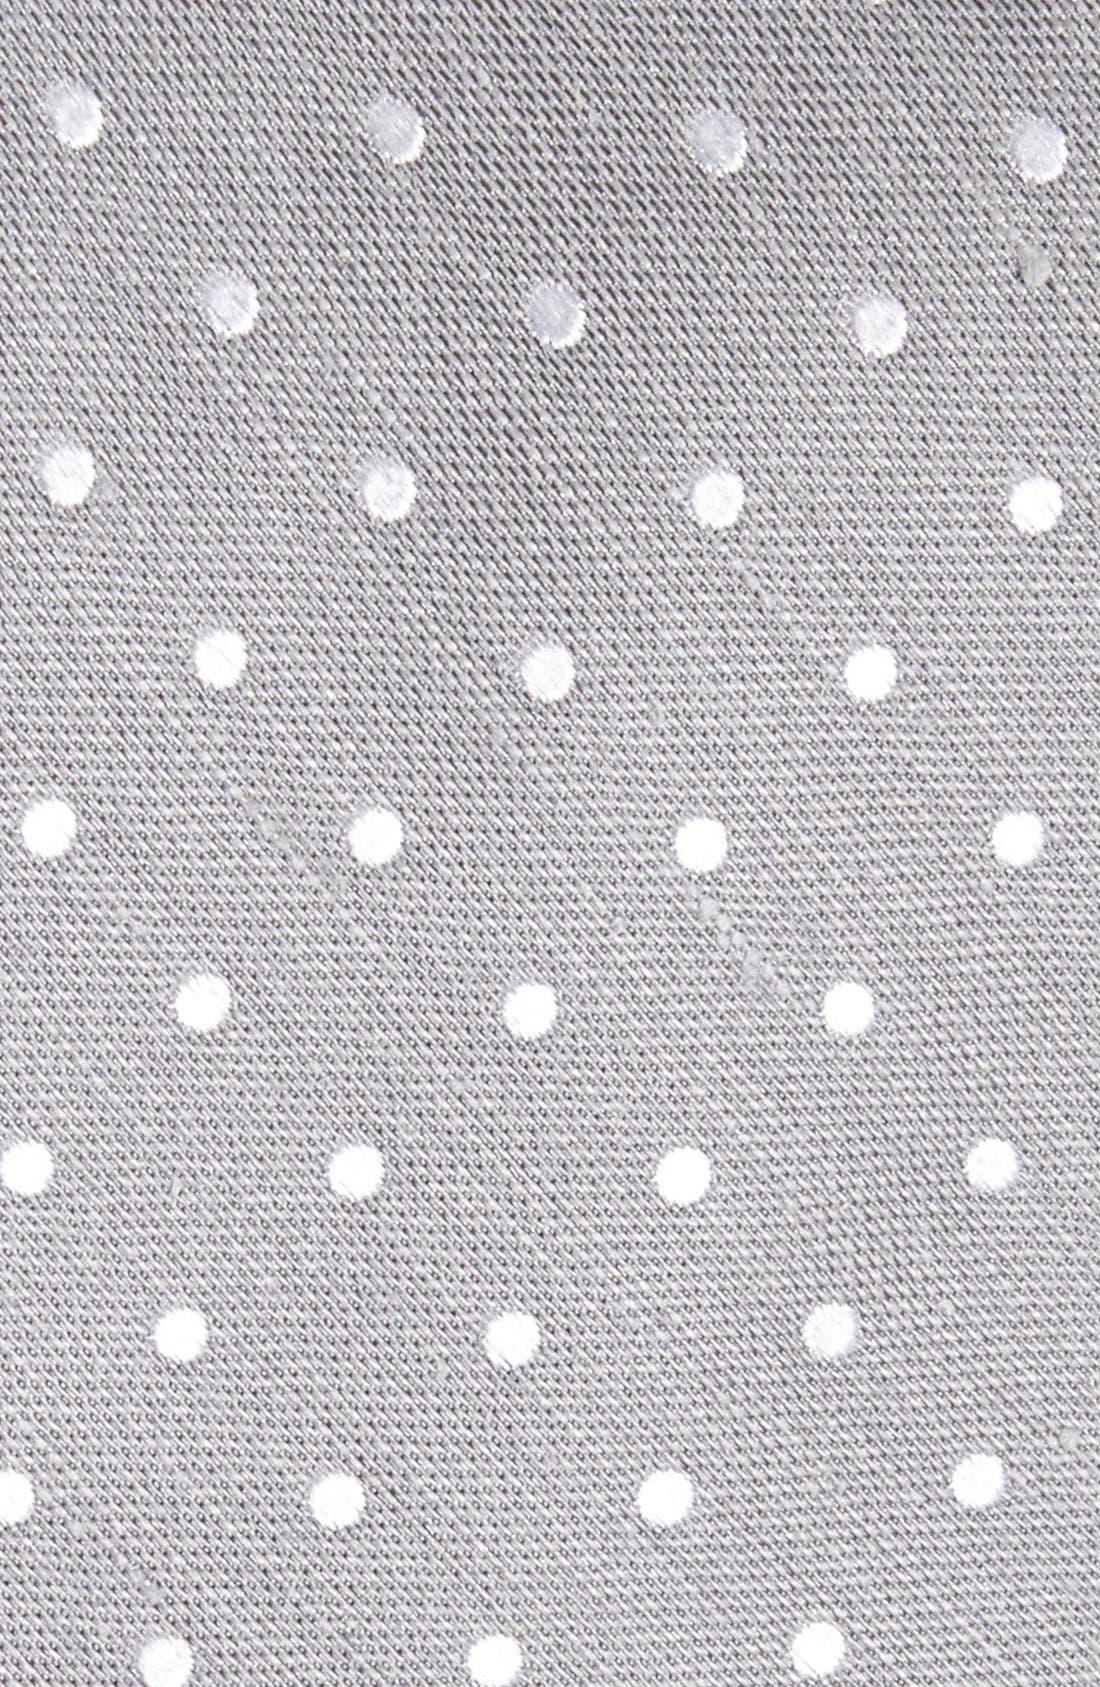 Dot Silk & Linen Tie,                             Alternate thumbnail 6, color,